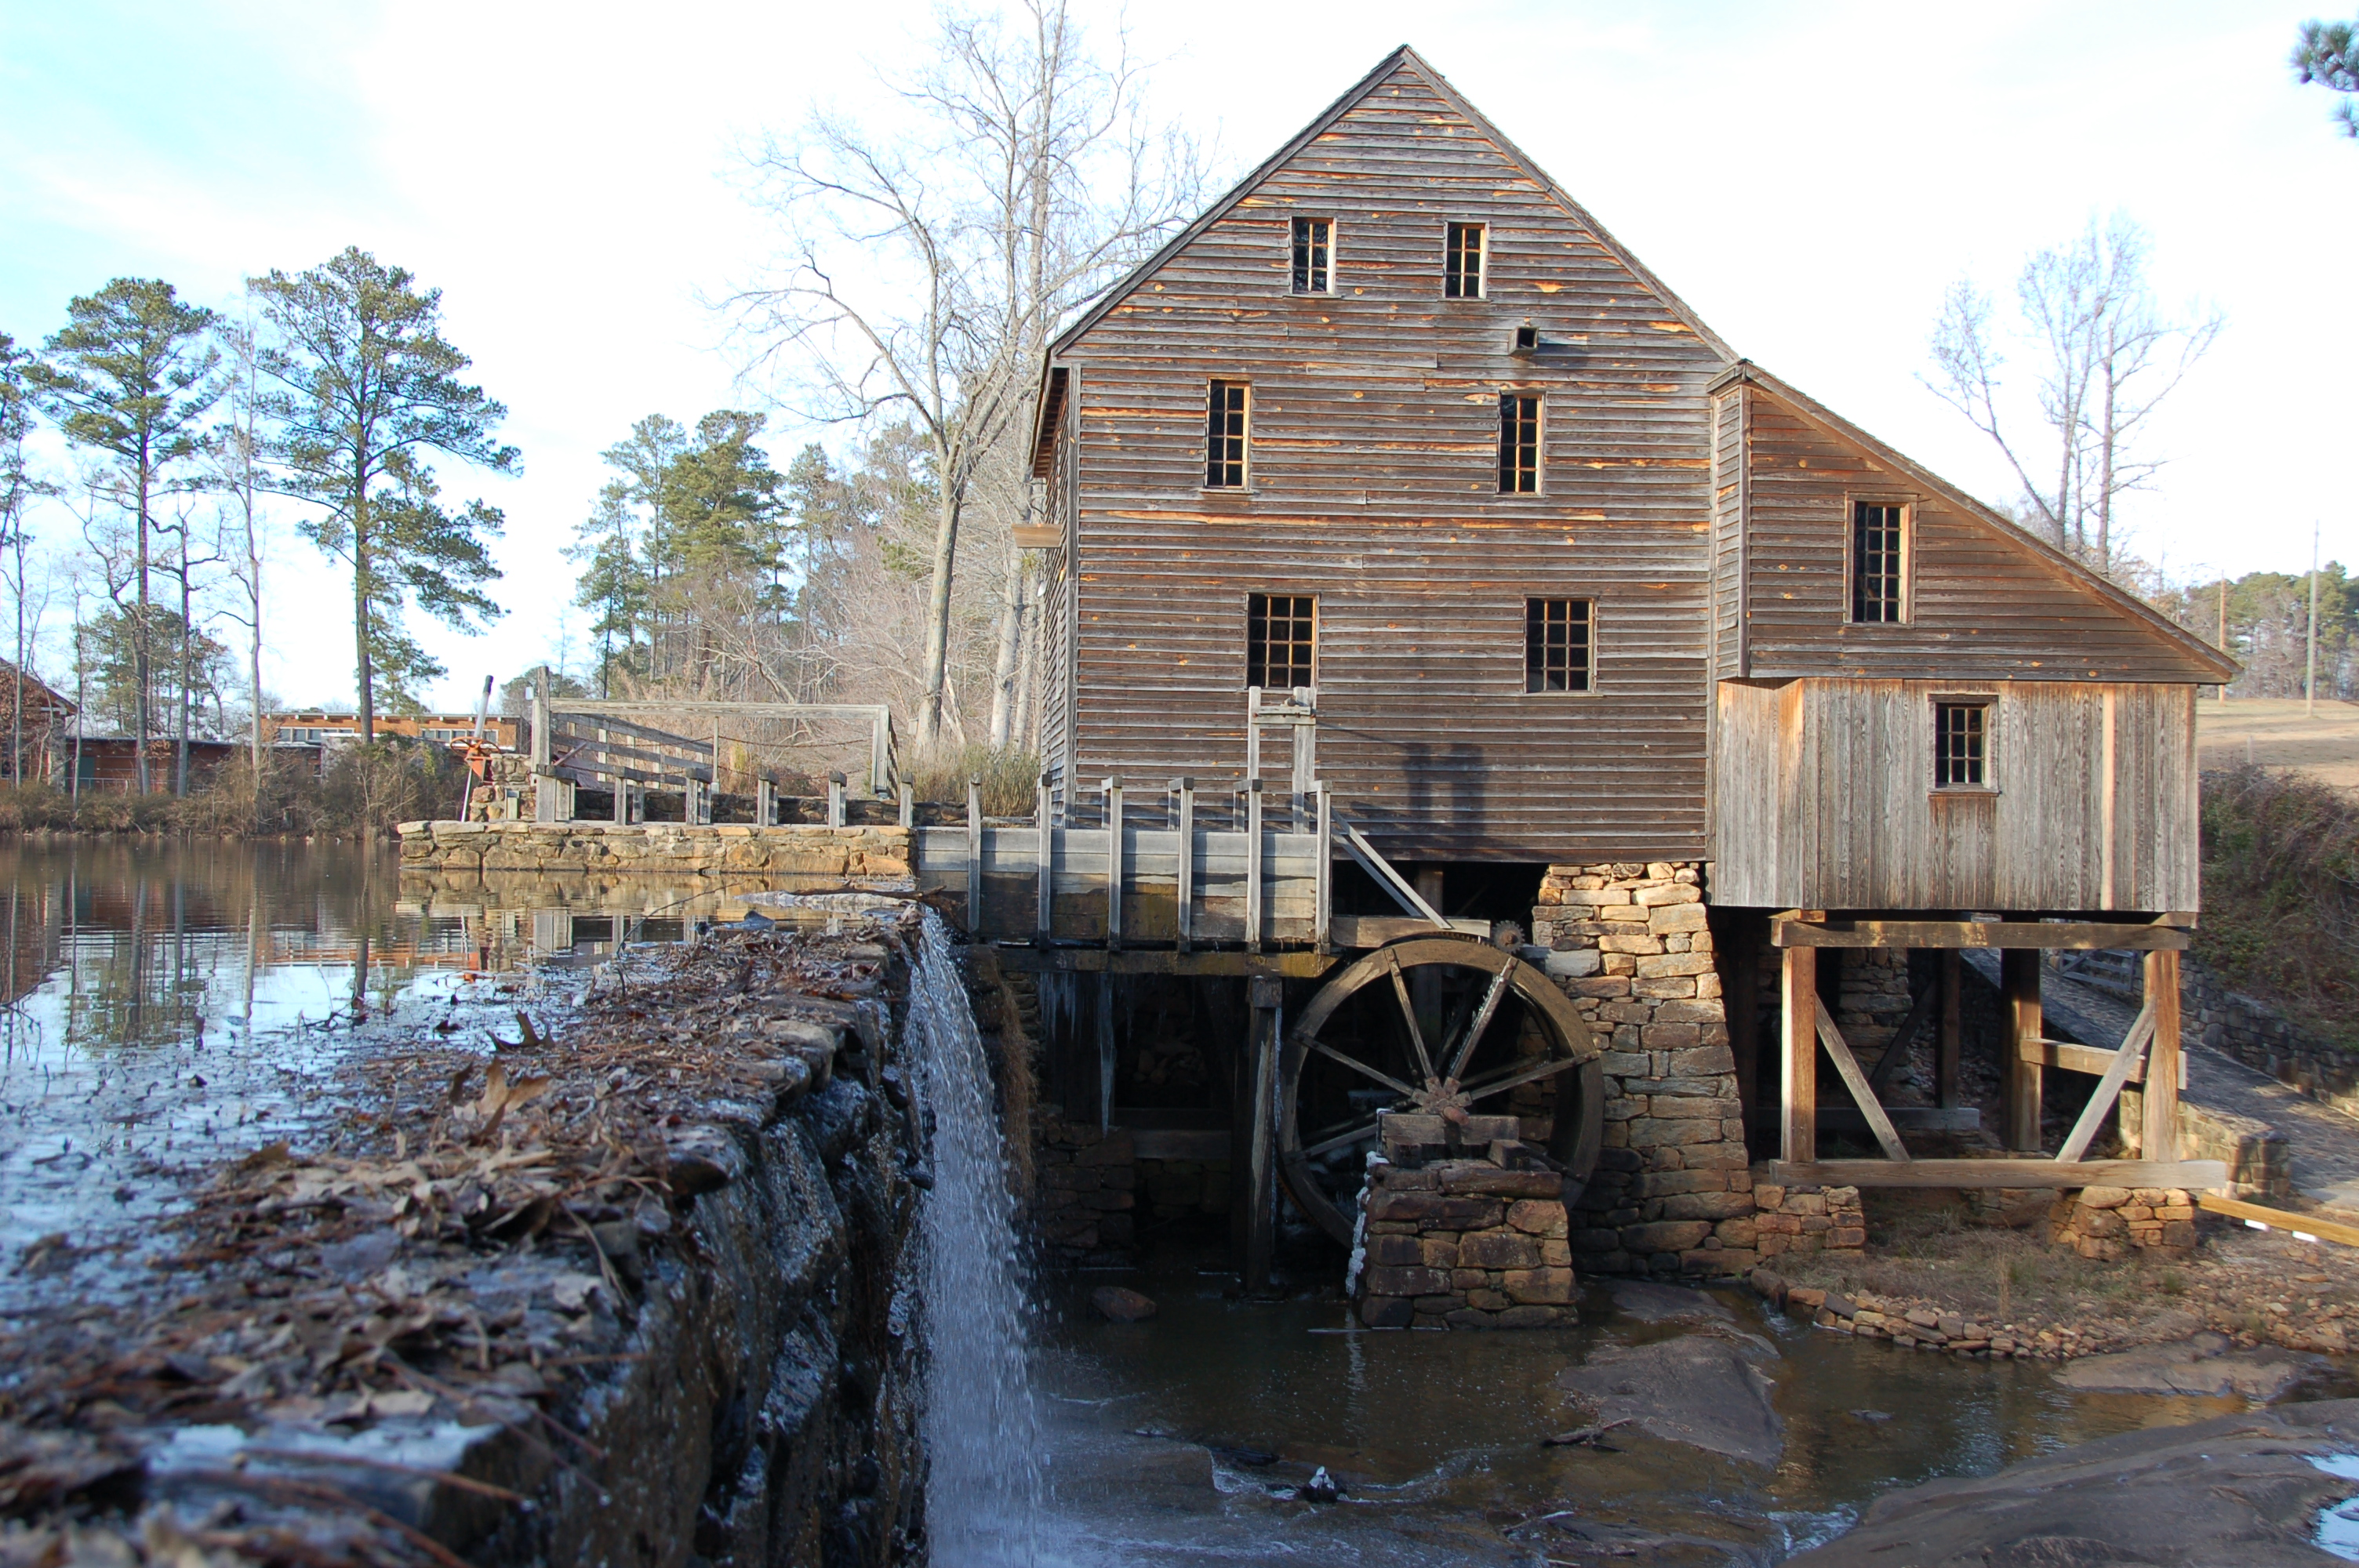 FileYates Mill at Yates Mill Pond Park eg Wikimedia